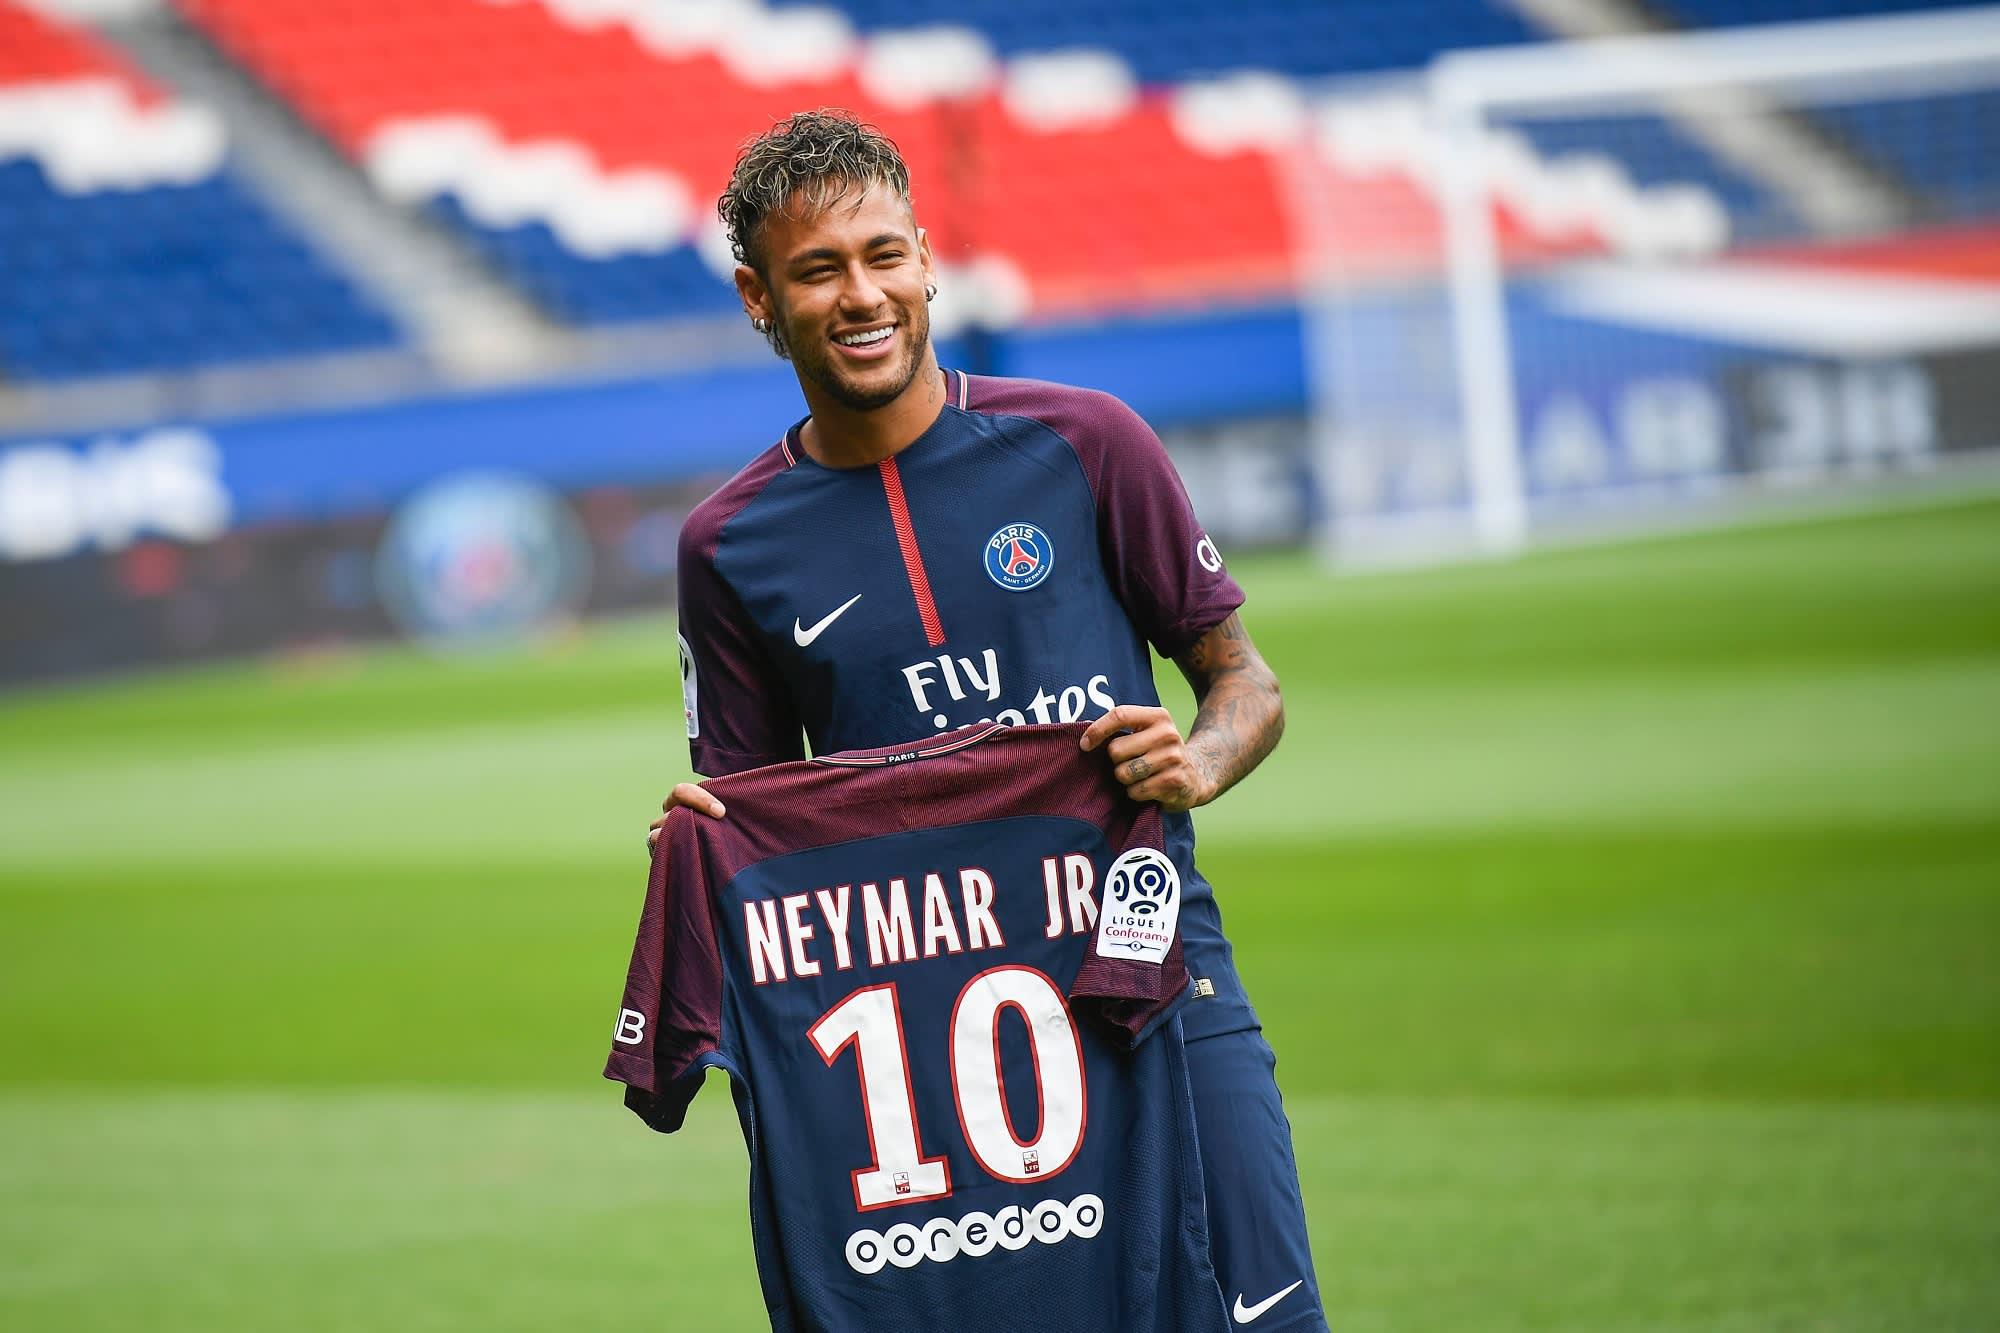 Vinicius Ingin Neymar Gabung Dengan Real Madrid